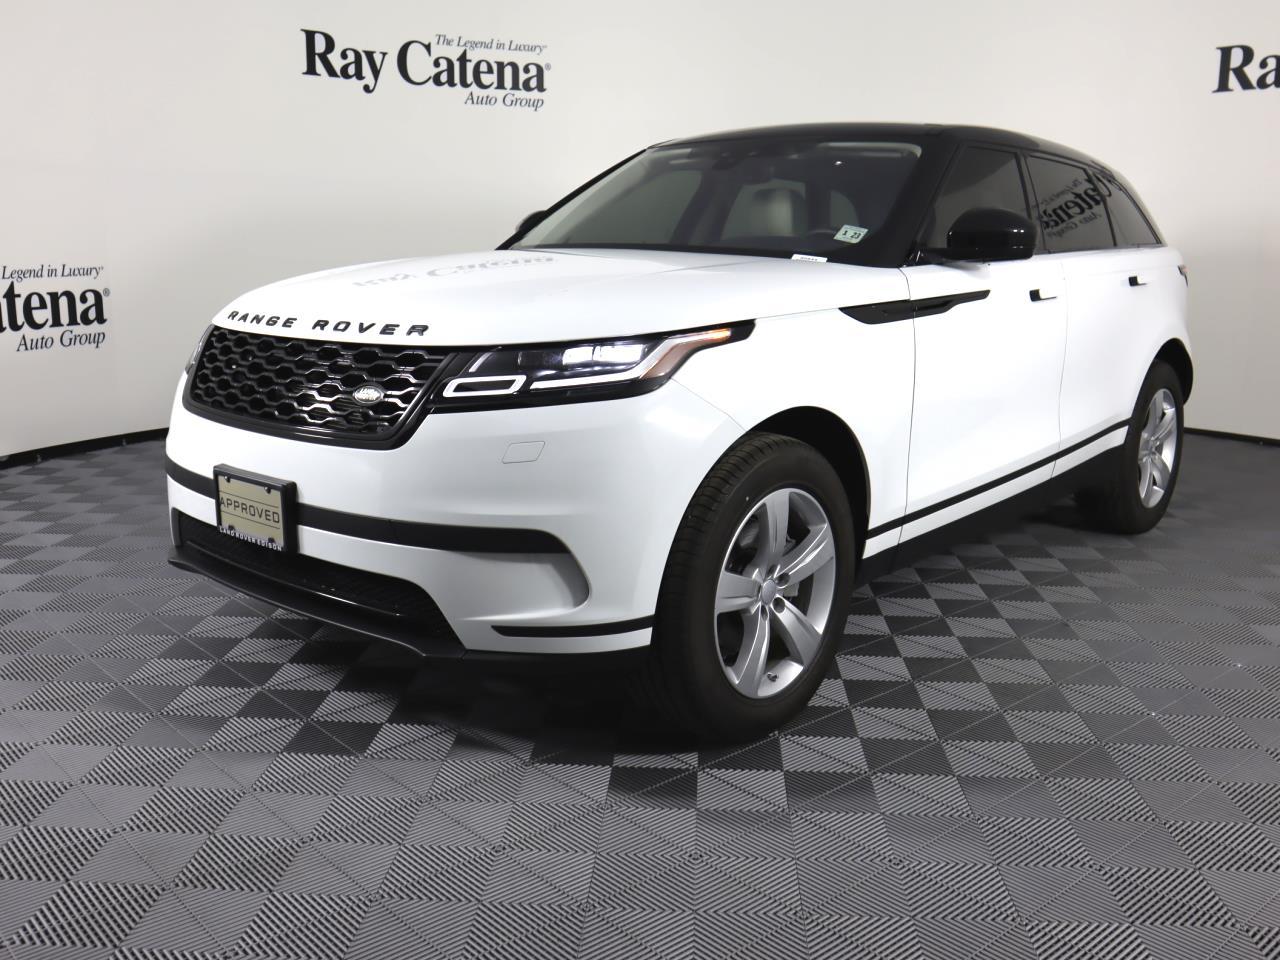 Certified Pre-Owned 2018 Land Rover Range Rover Velar P250 S